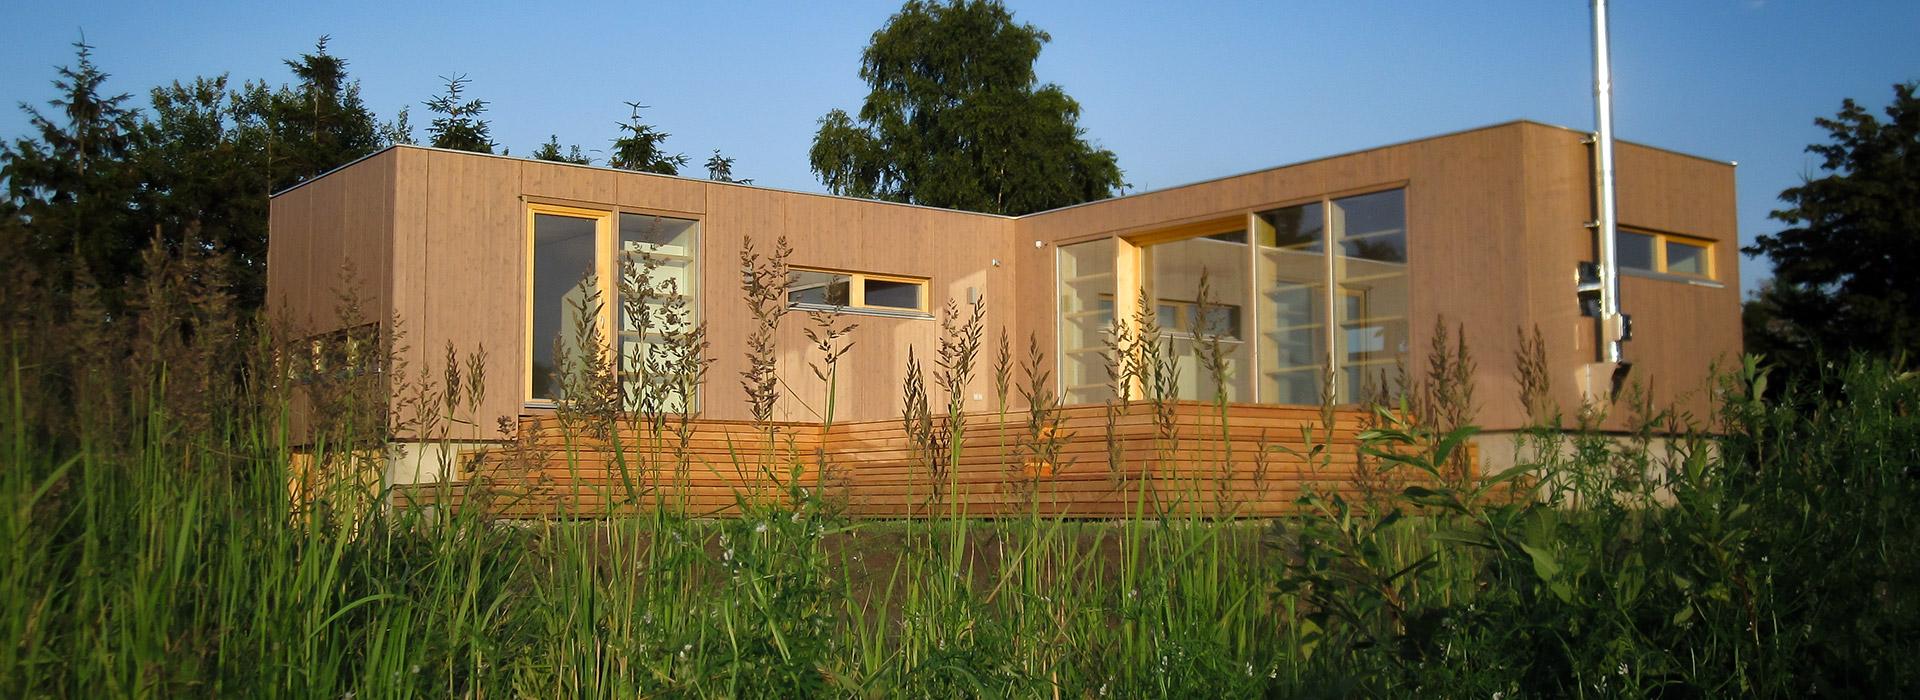 modernes-ferienhaus-an-der-ostsee